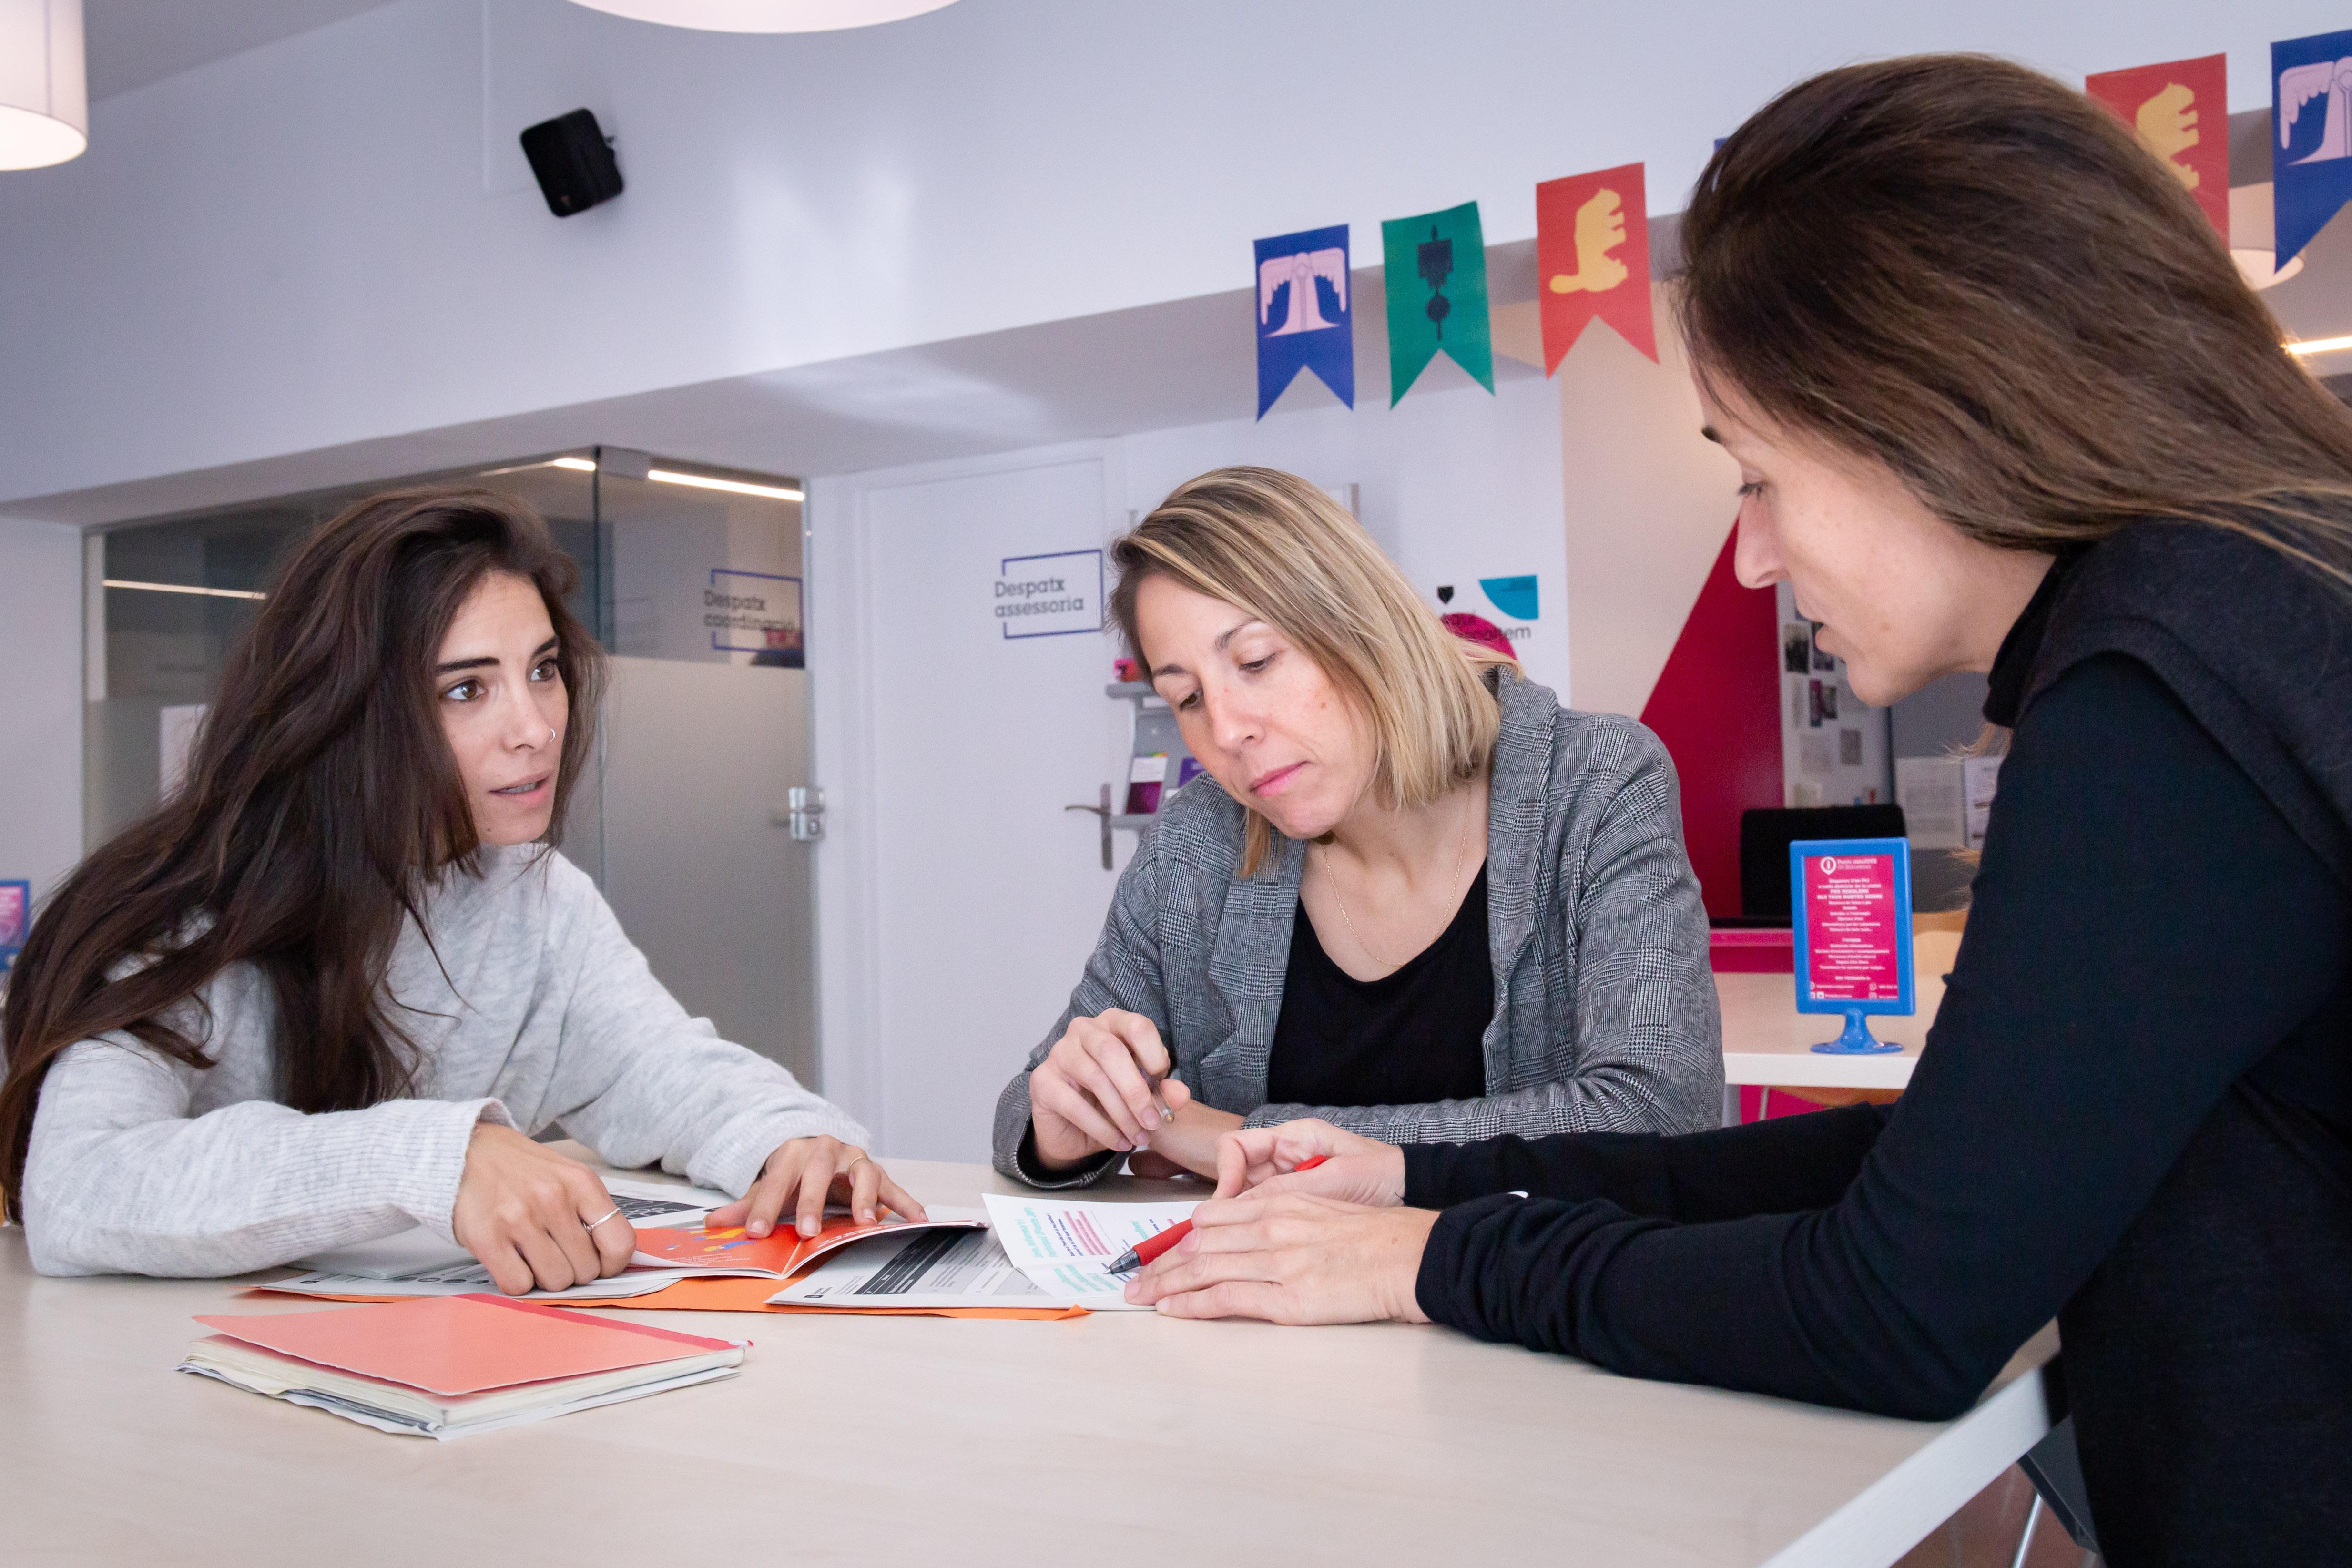 Assessoria laboral per a joves